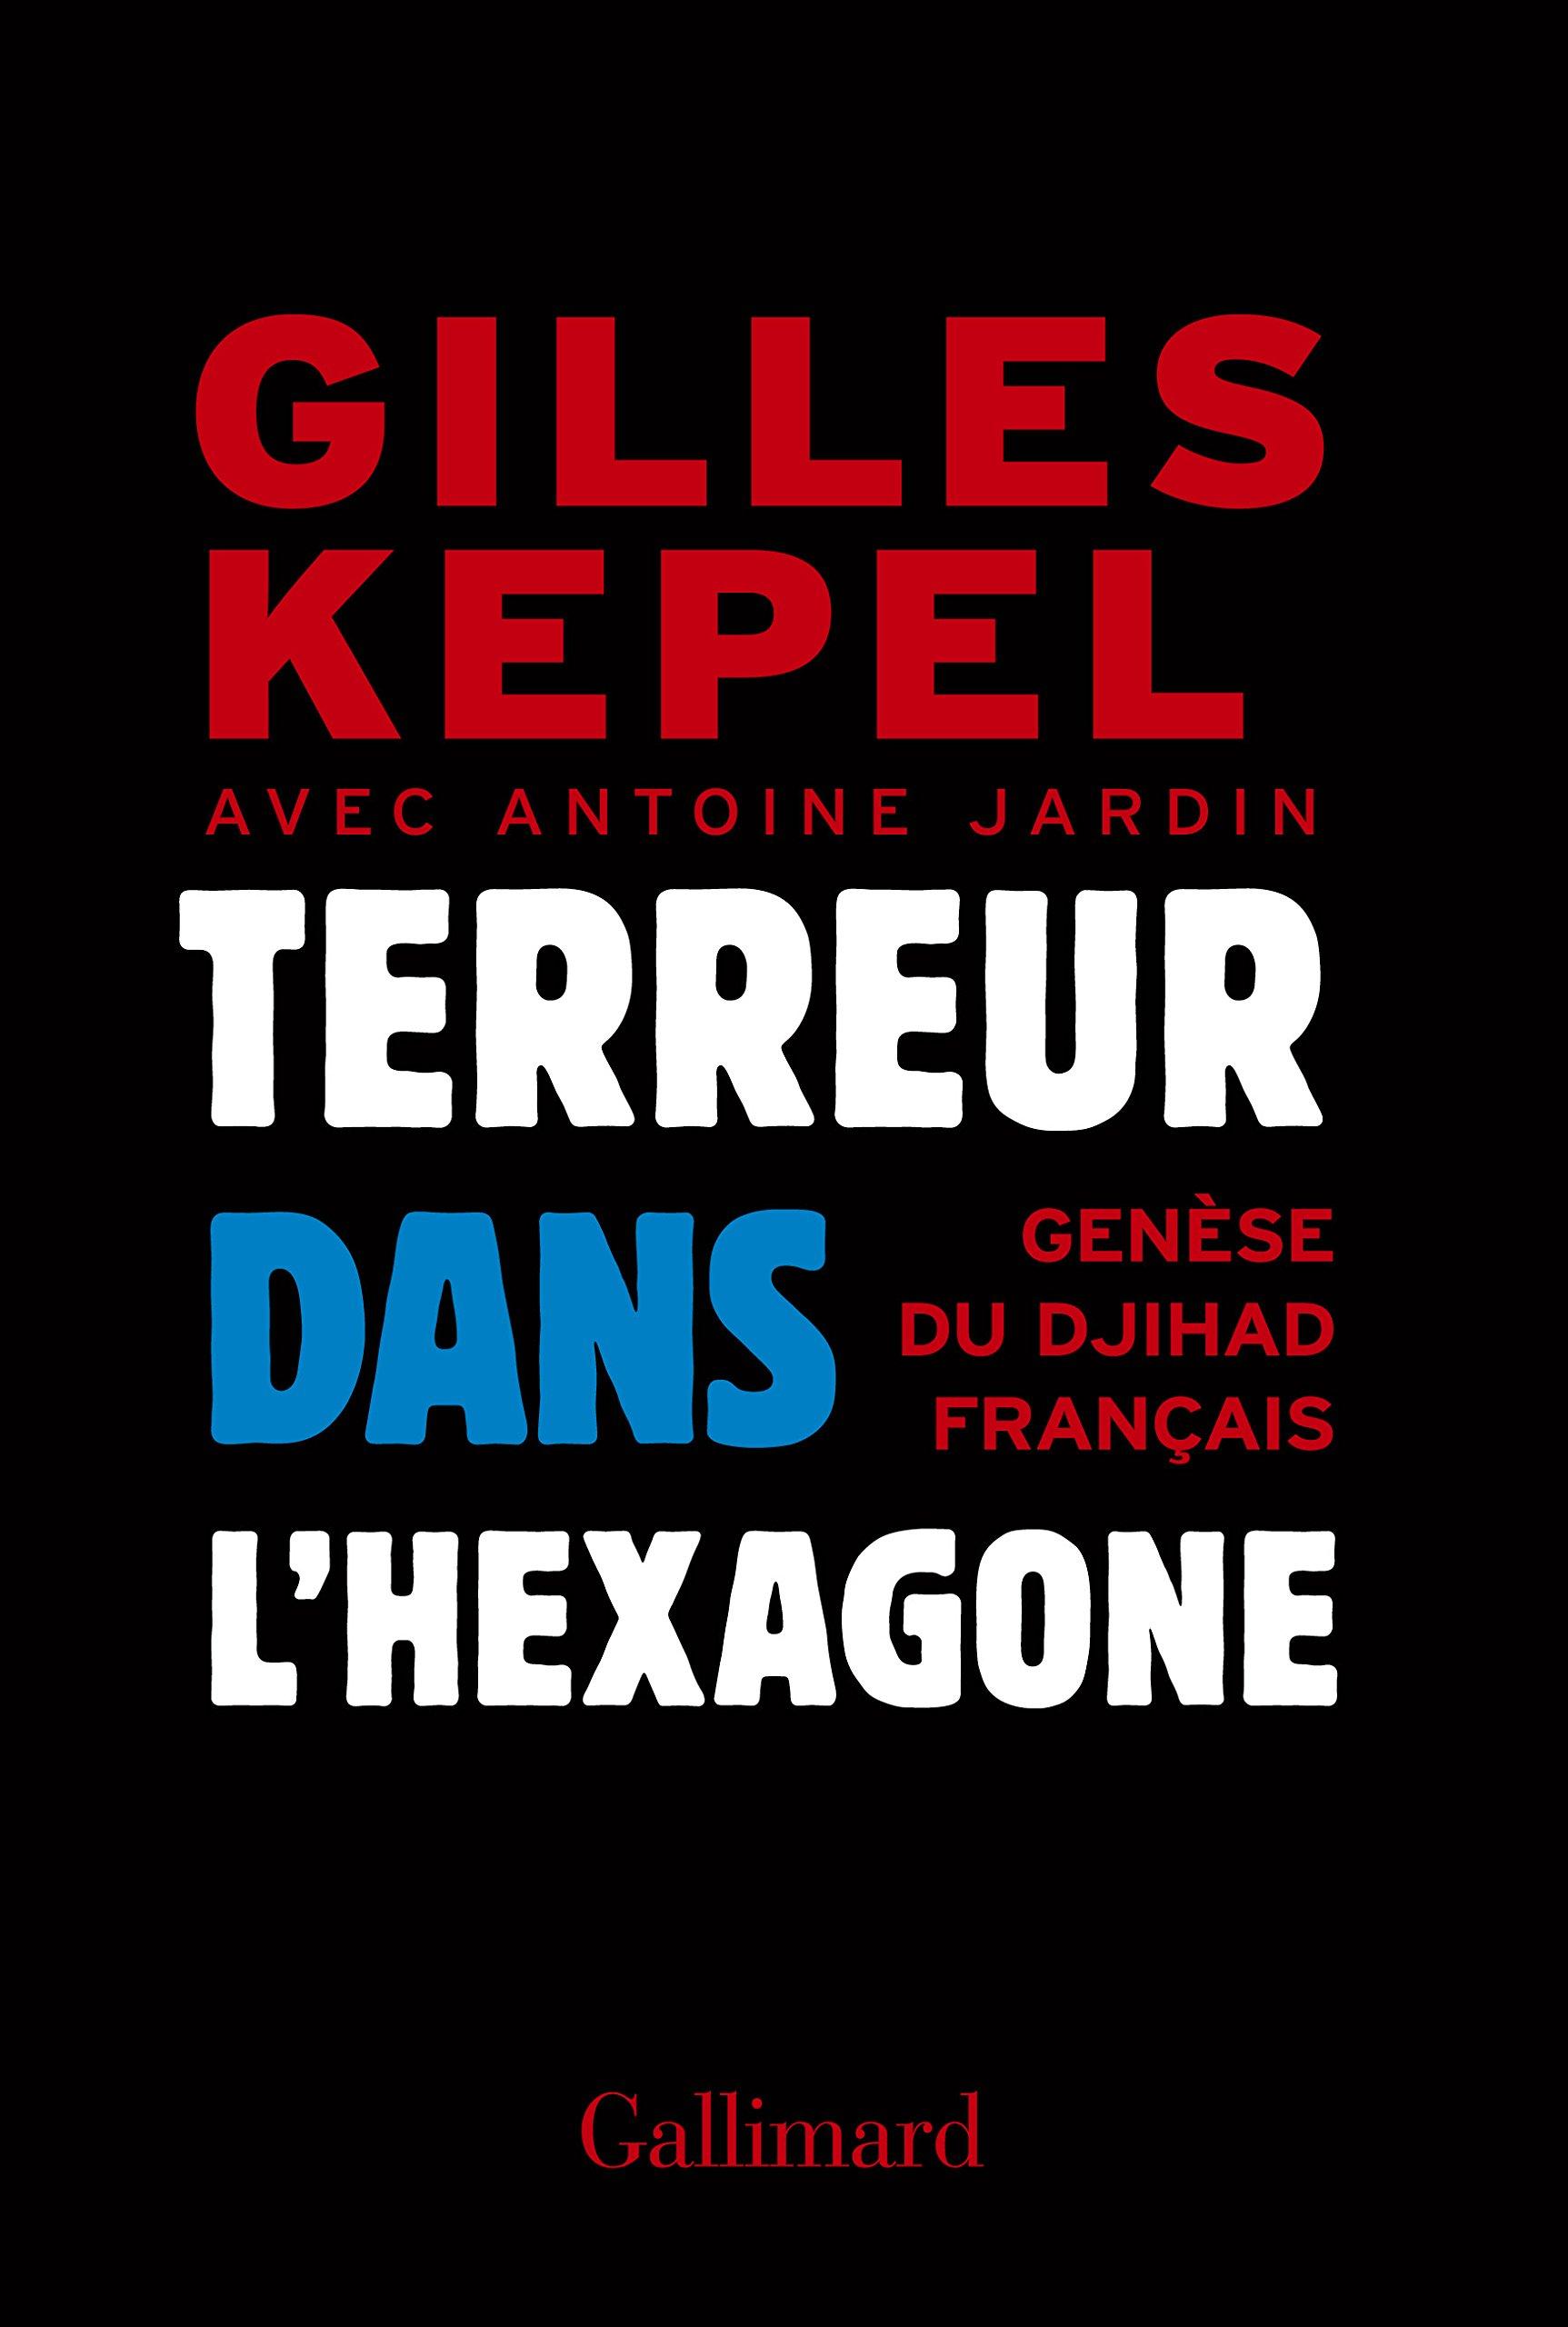 Terreur dans l'Hexagone: 2005-2015, genèse du djihad français